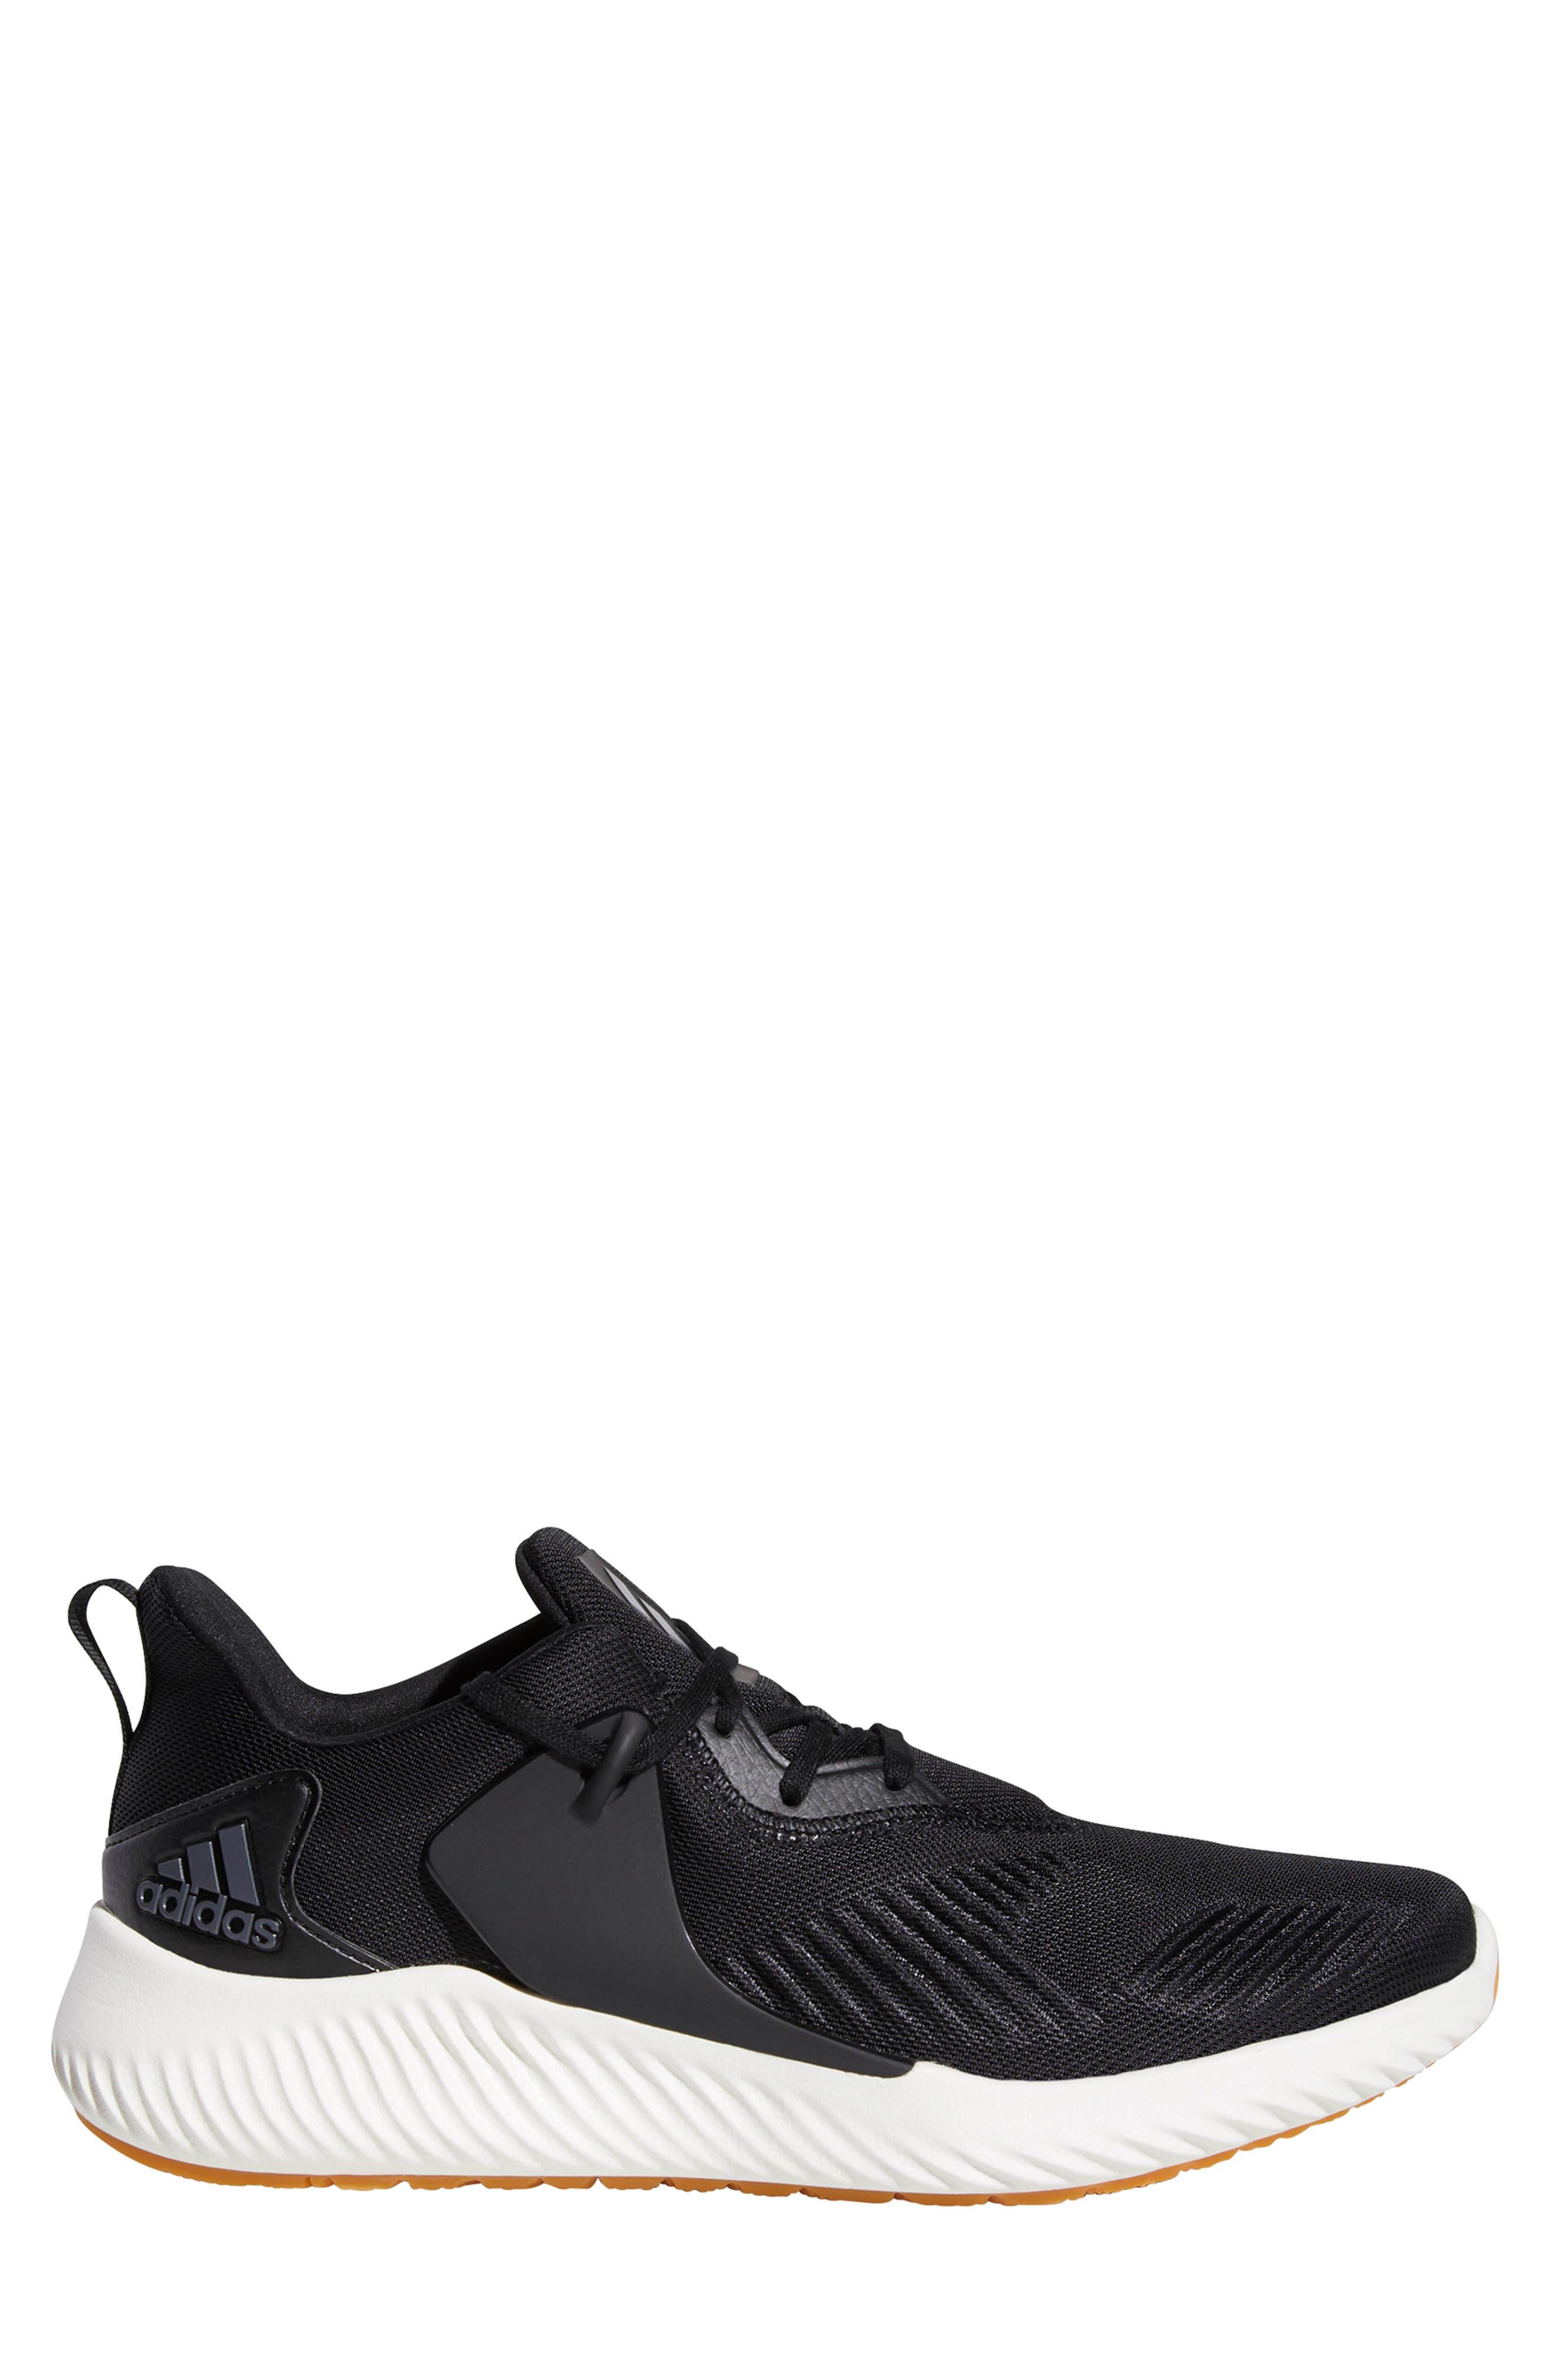 AlphaBounce RC 2 Running Shoe,                             Alternate thumbnail 3, color,                             CORE BLACK/ NIGHT/ CORE BLACK